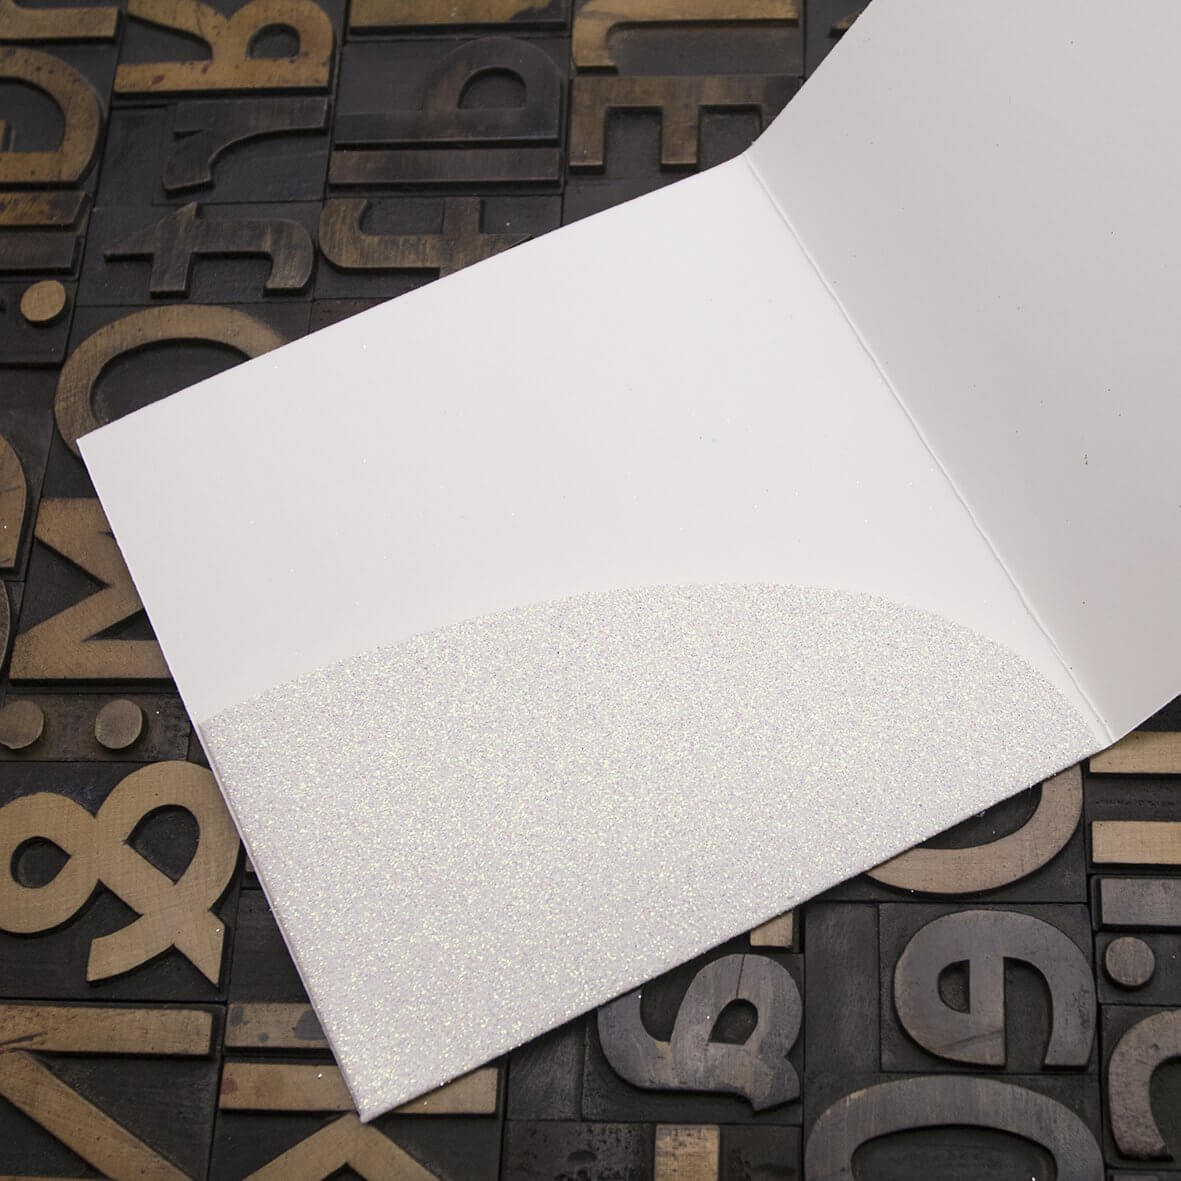 Enfolio Pocket Card - Iridescent White Glitter Card